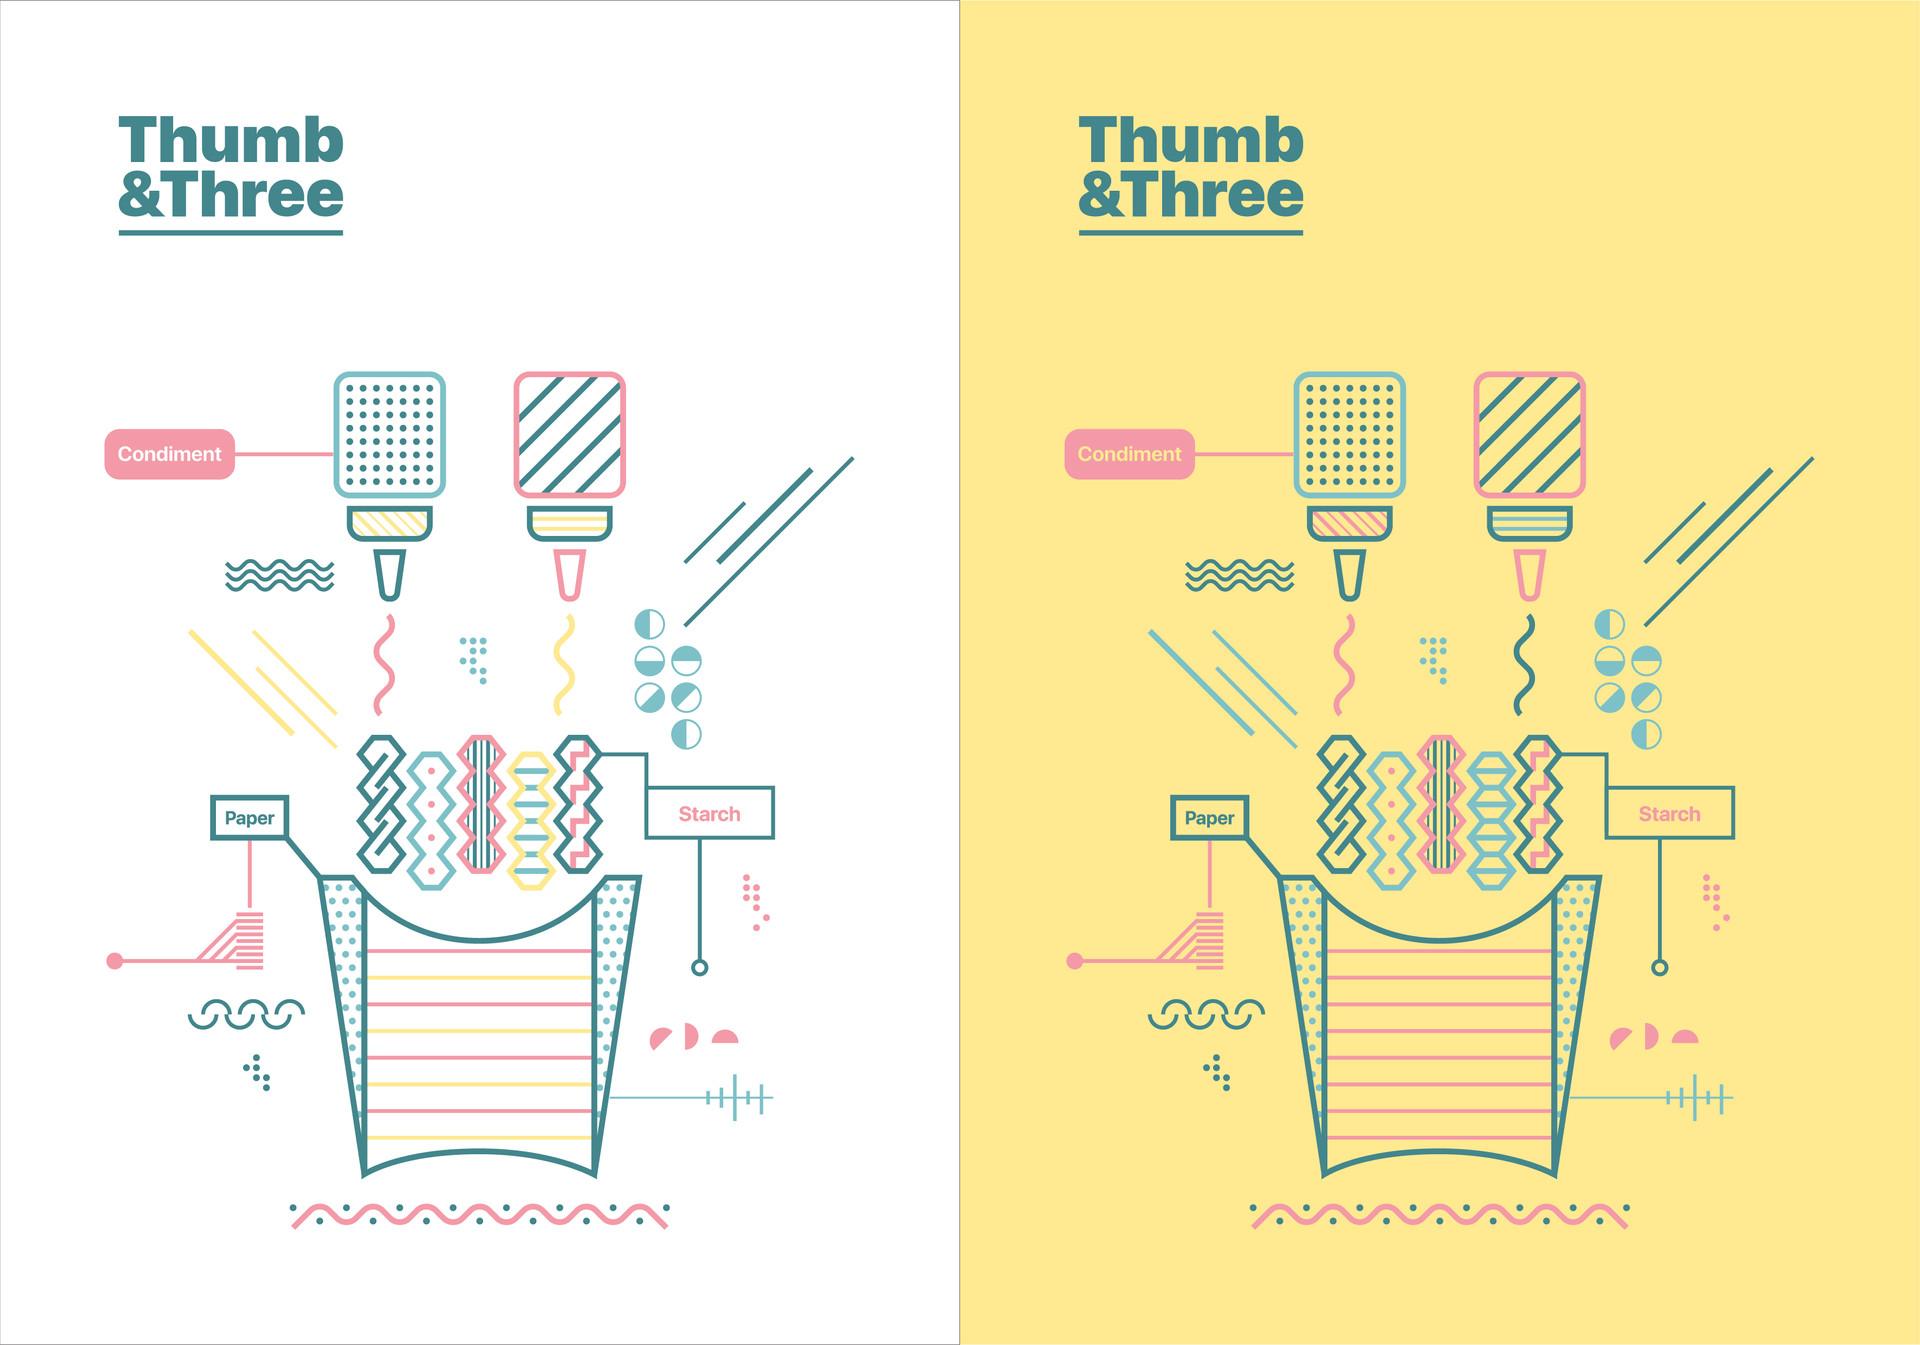 Three&Thumb-05.jpg